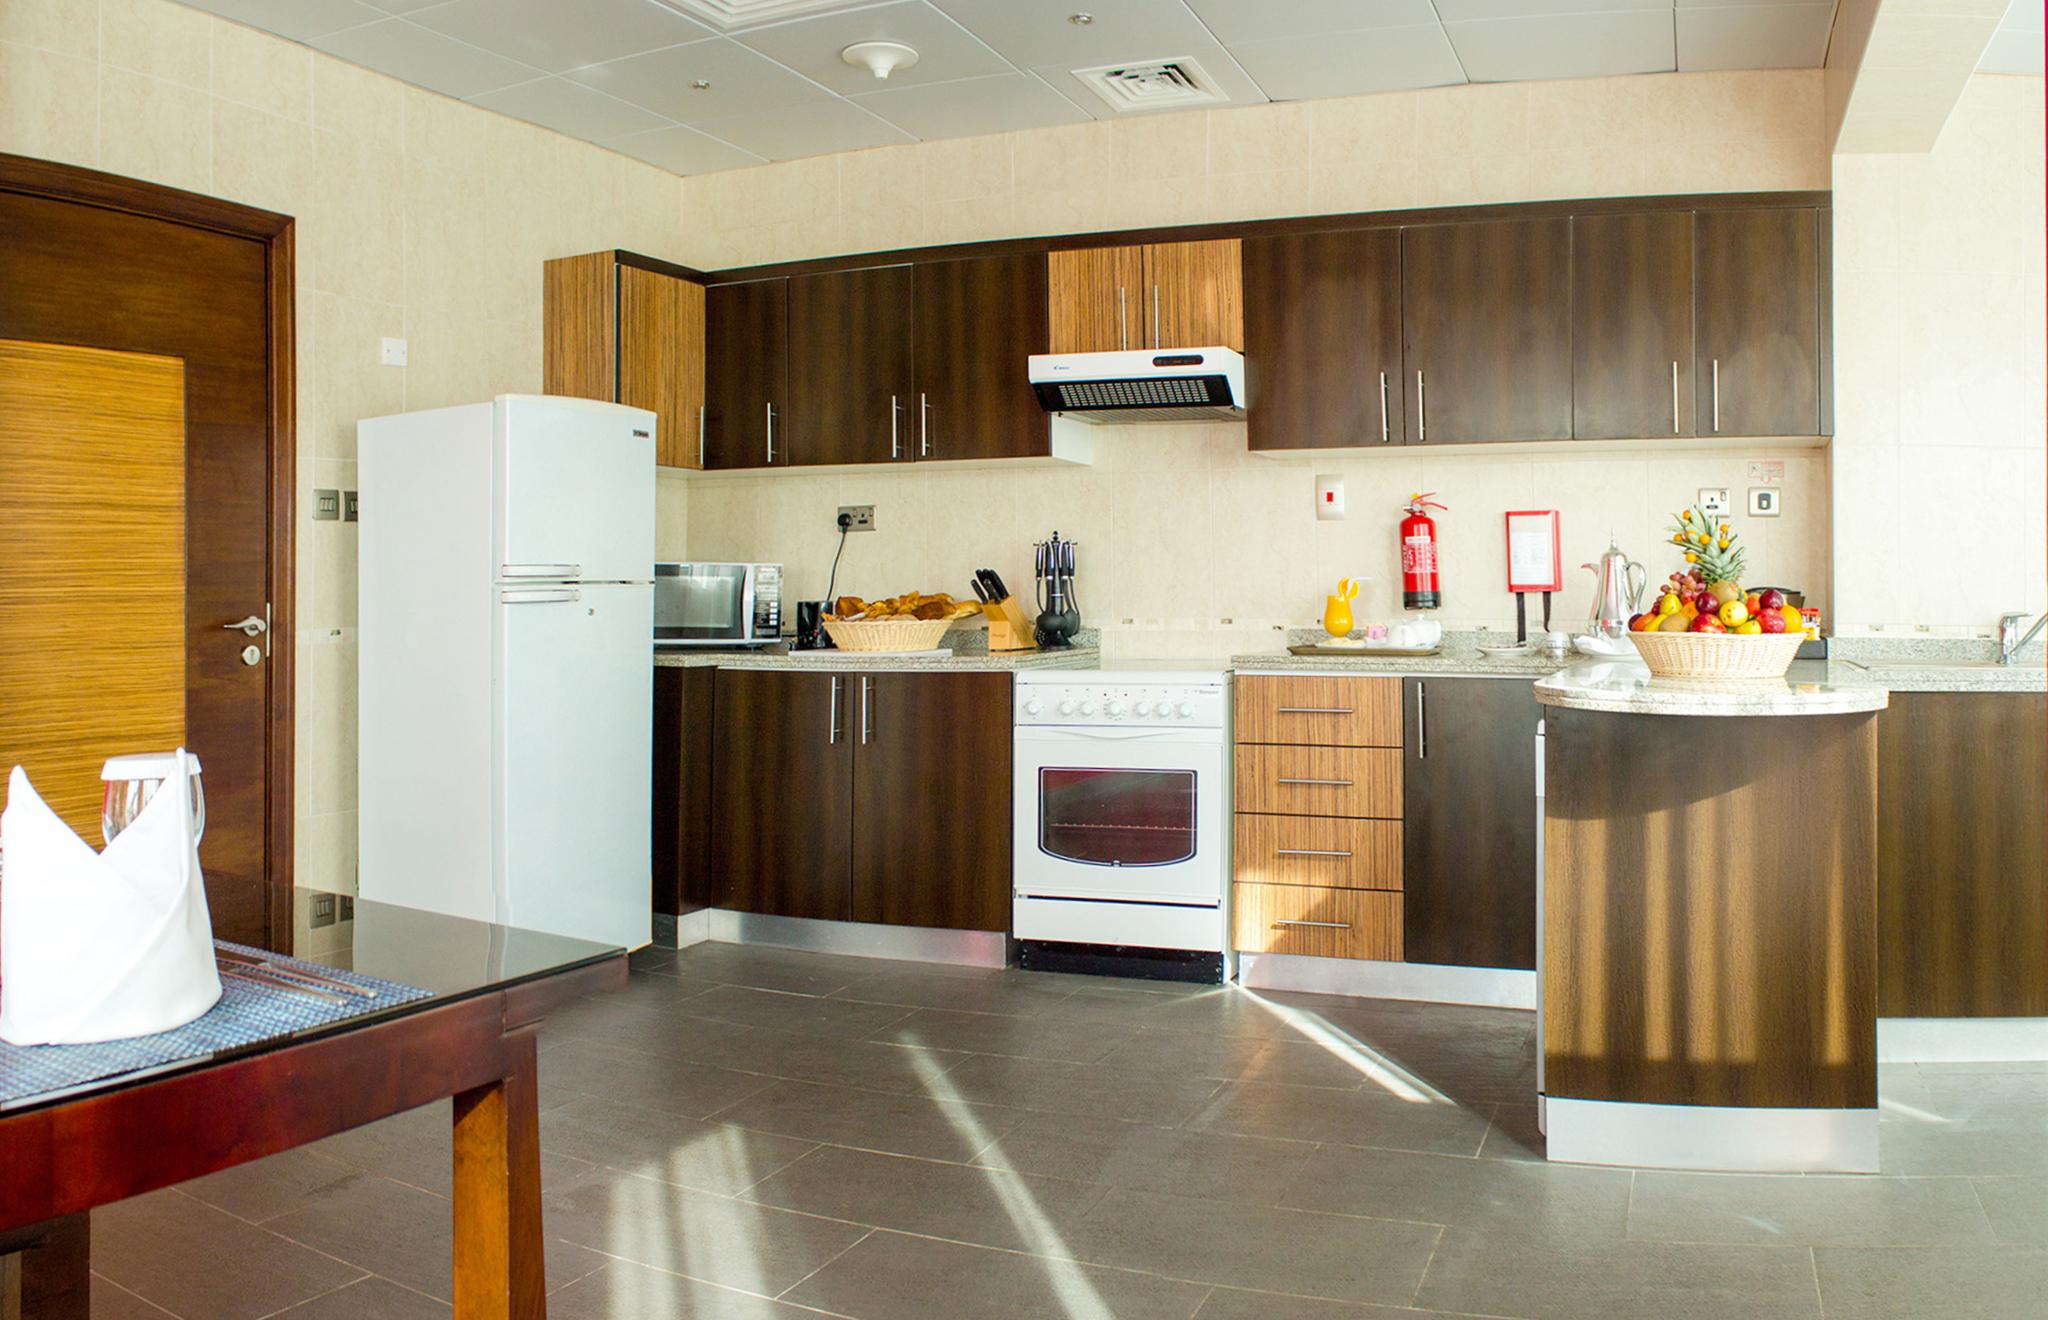 Image CPHA_4BR_Penthouse_Kitchen.jpg